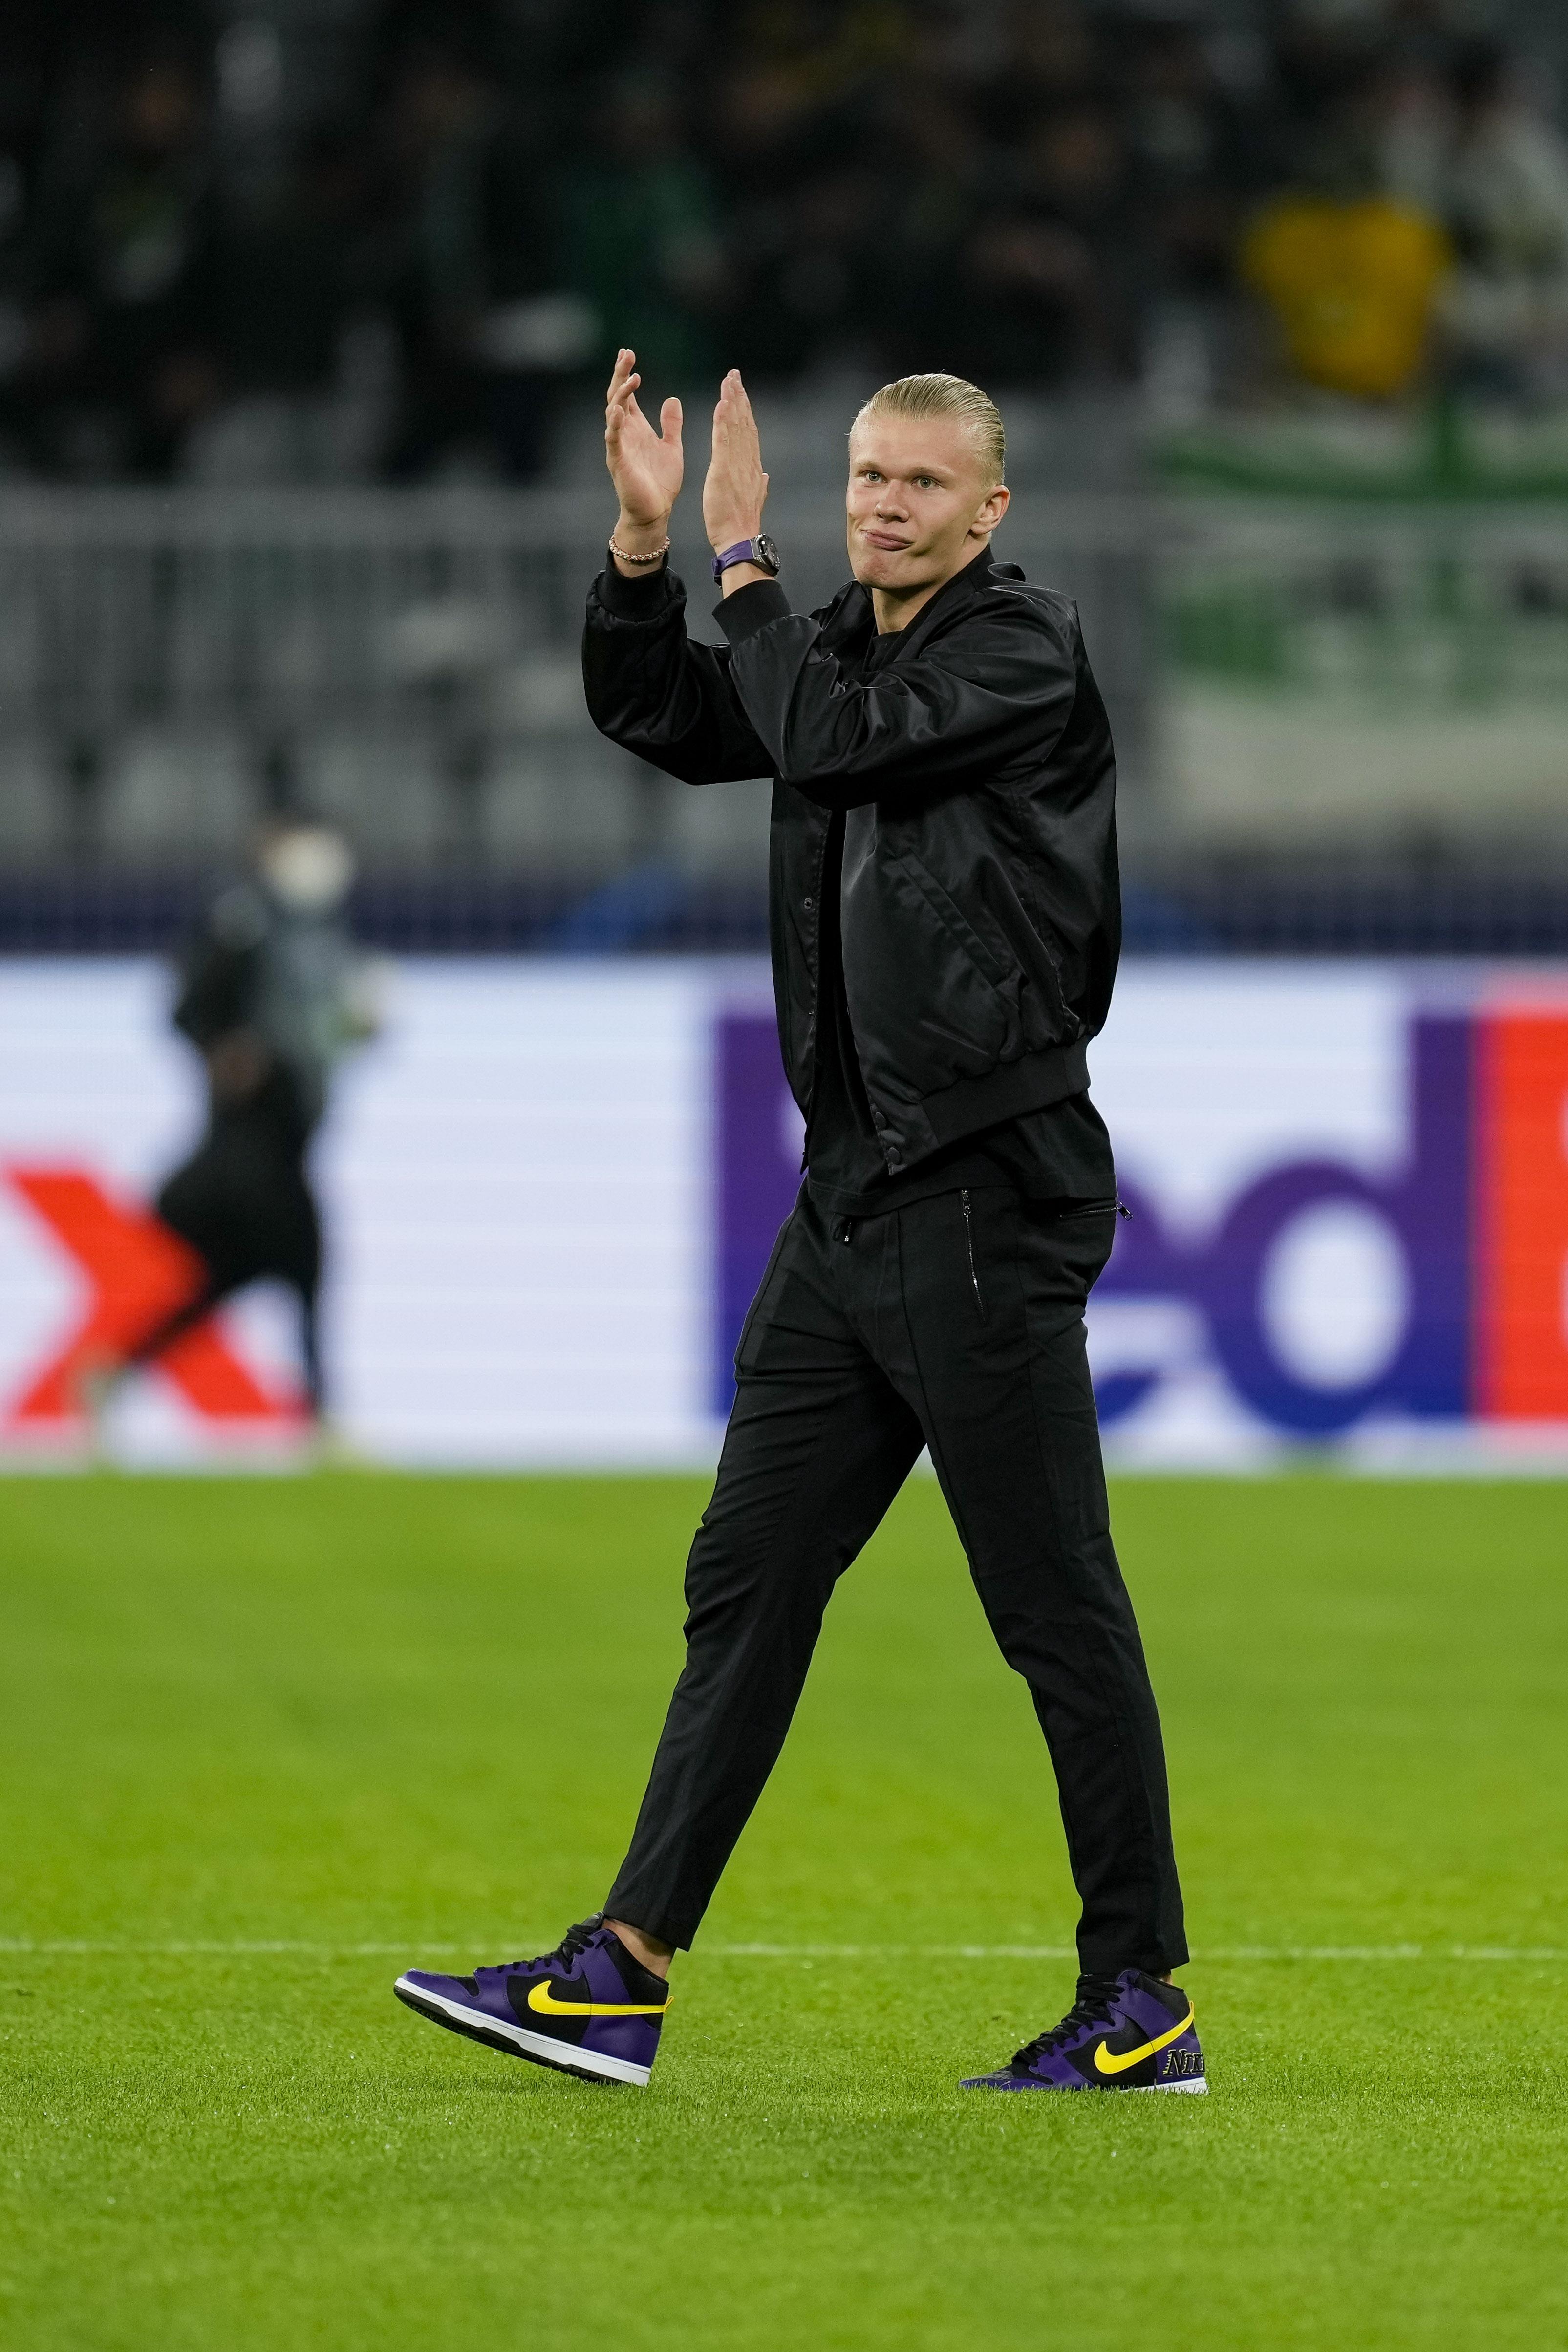 Borussia Dortmund v Sporting CP - Group C - UEFA Champions League